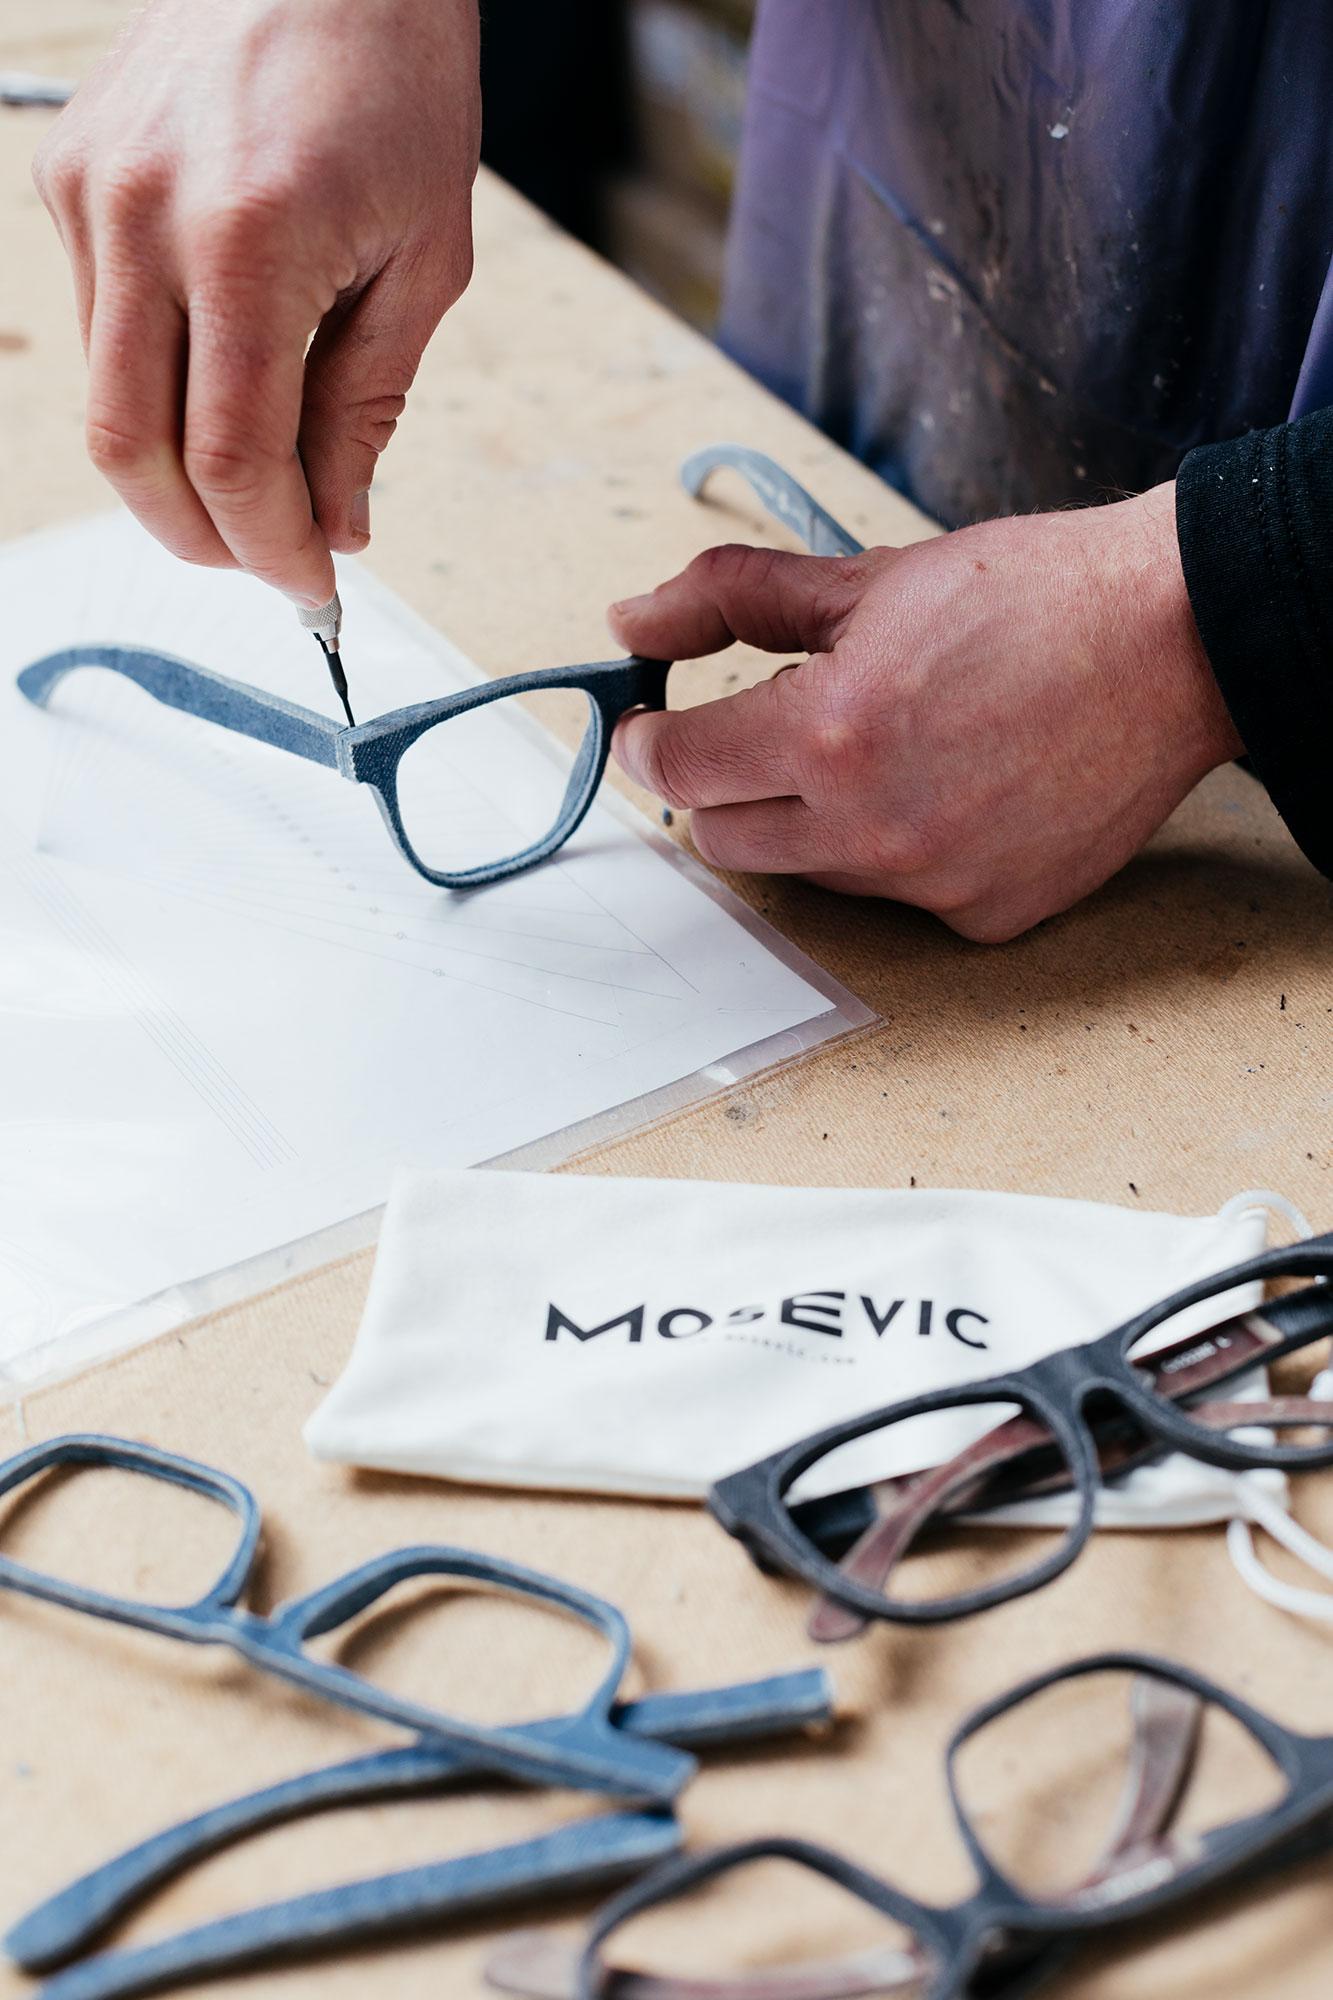 Mosevic, Sunglasses